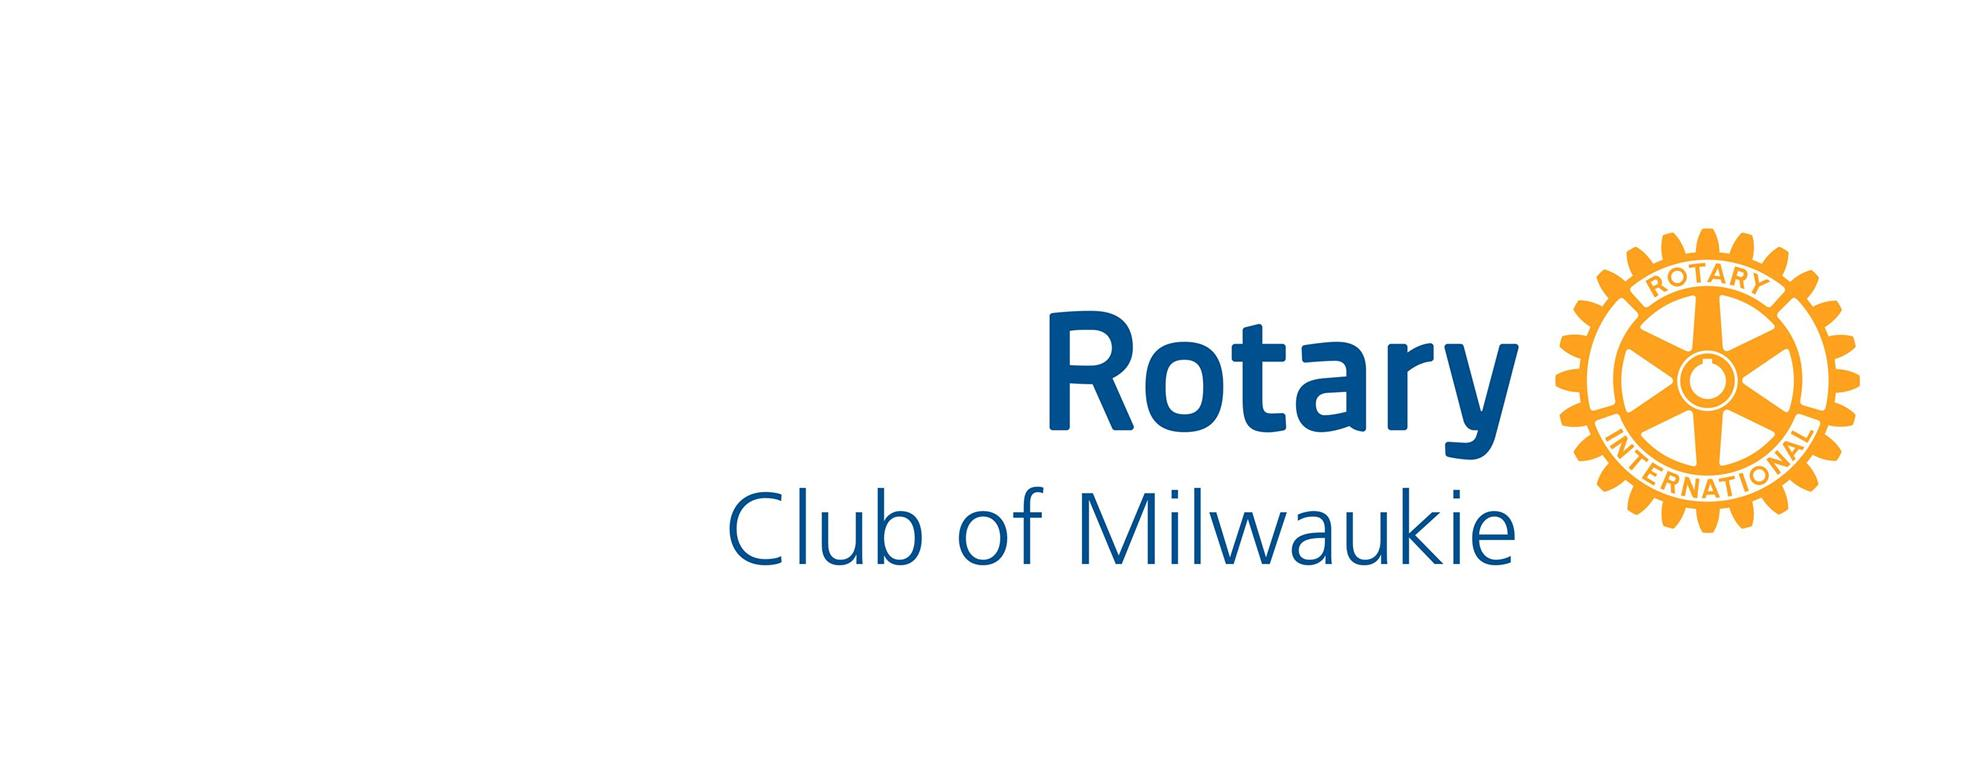 Club Board Meeting